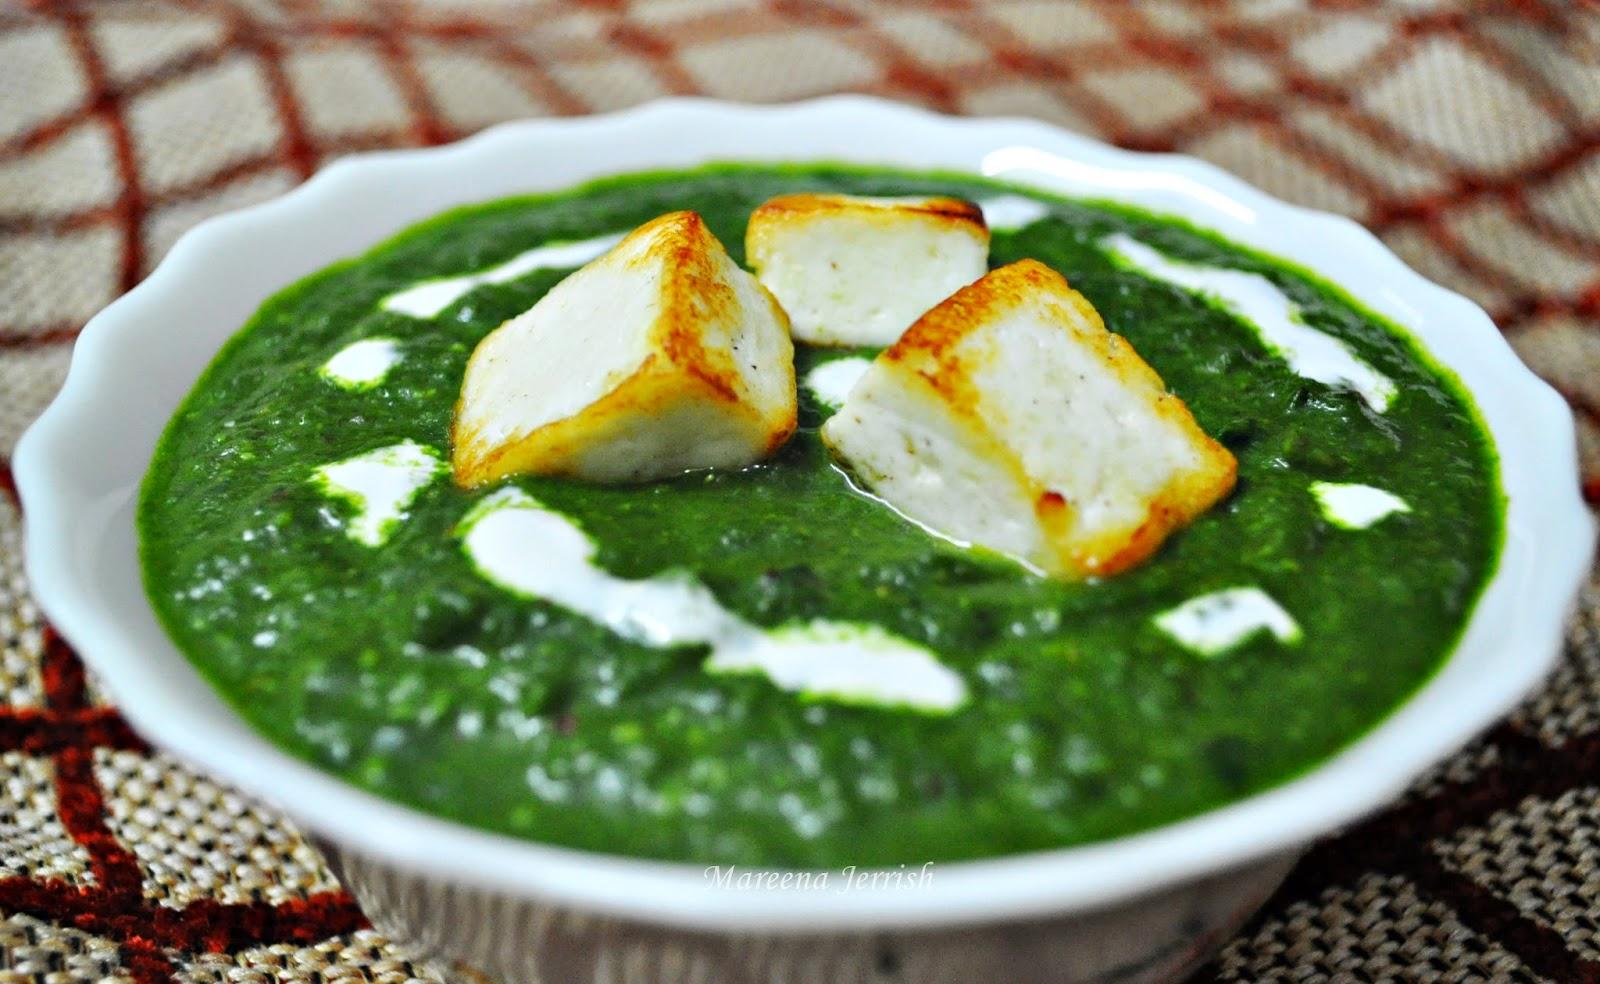 Voyage En Inde Apprendre La Cuisine Indienne